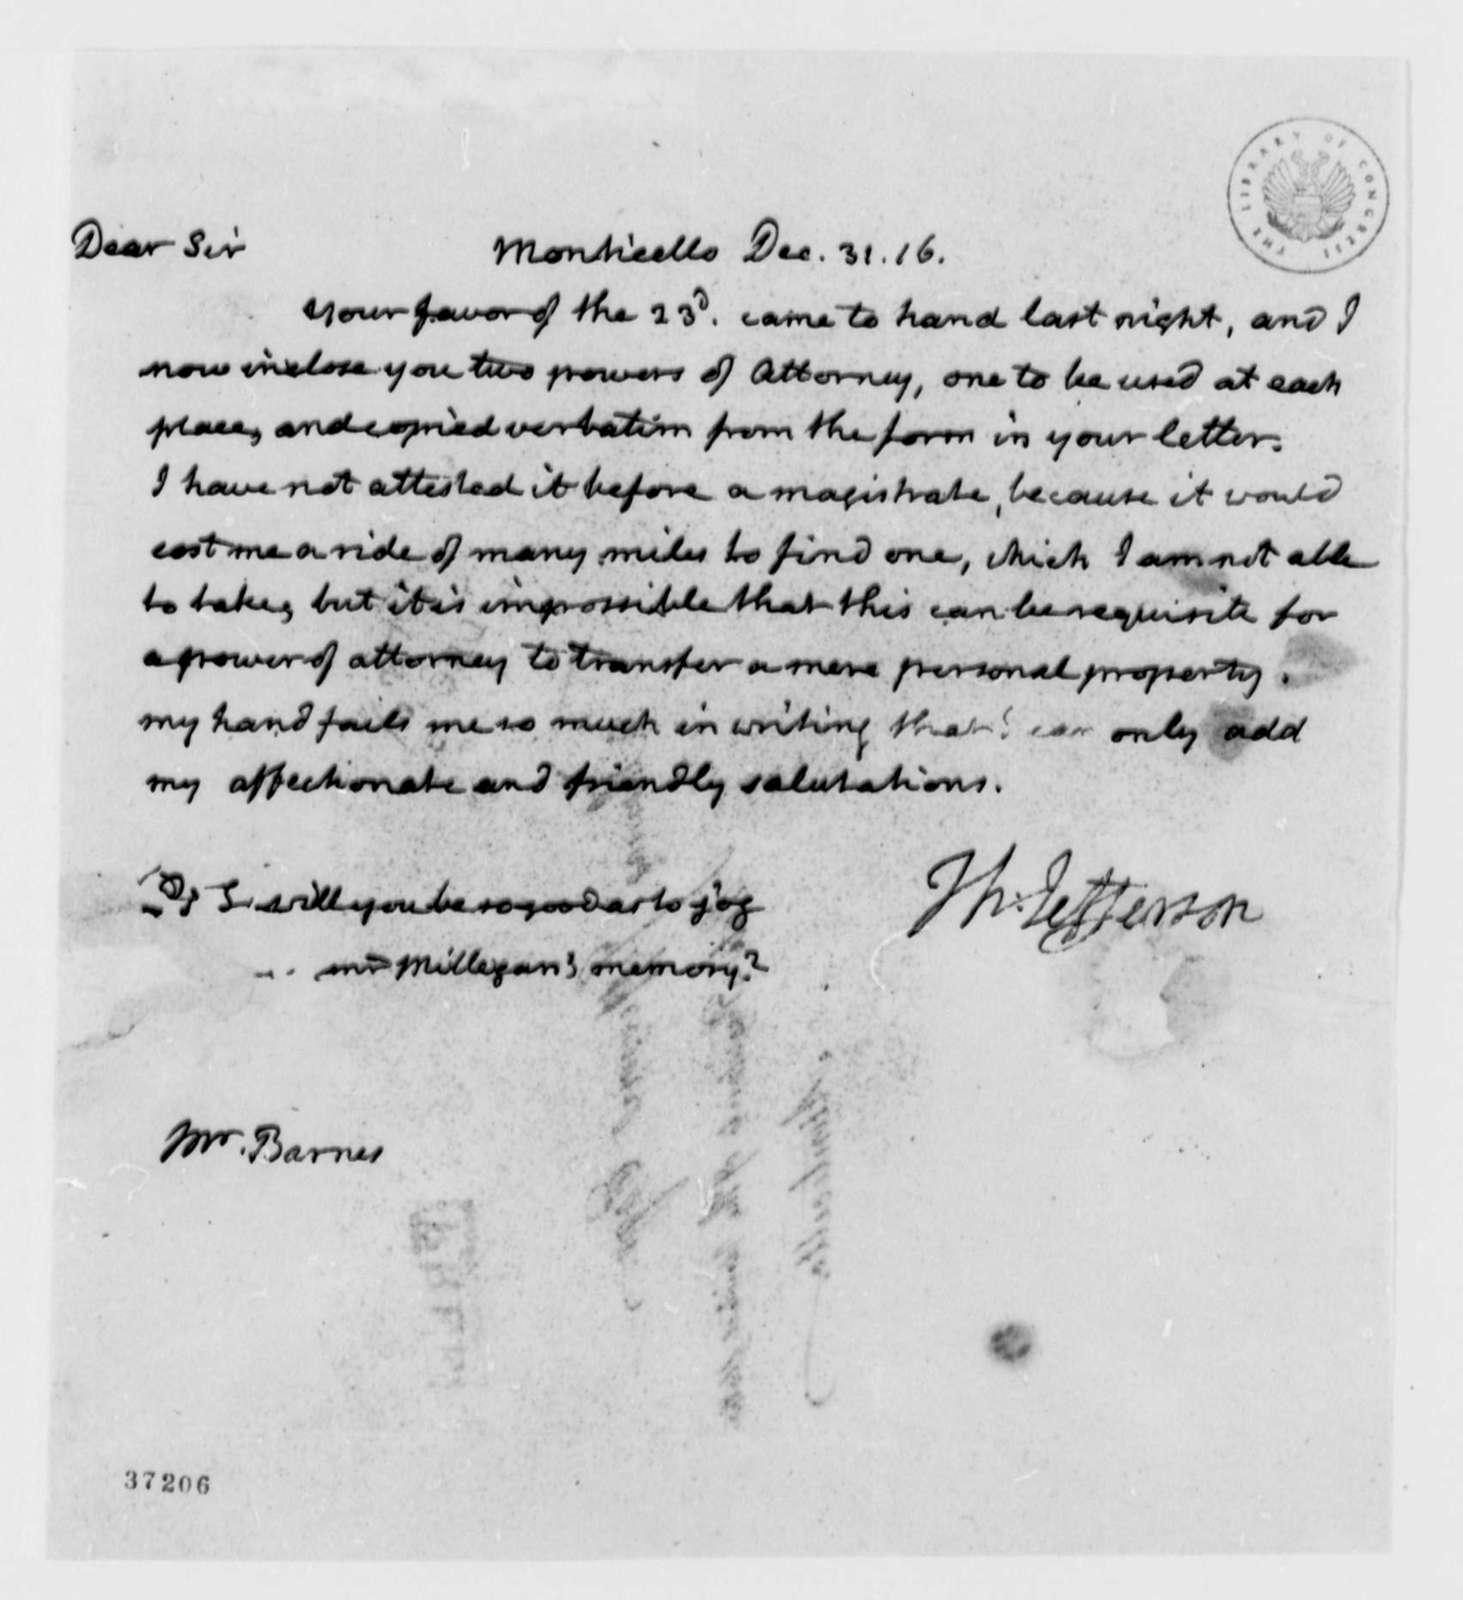 Thomas Jefferson to John S. Barnes, December 31, 1816